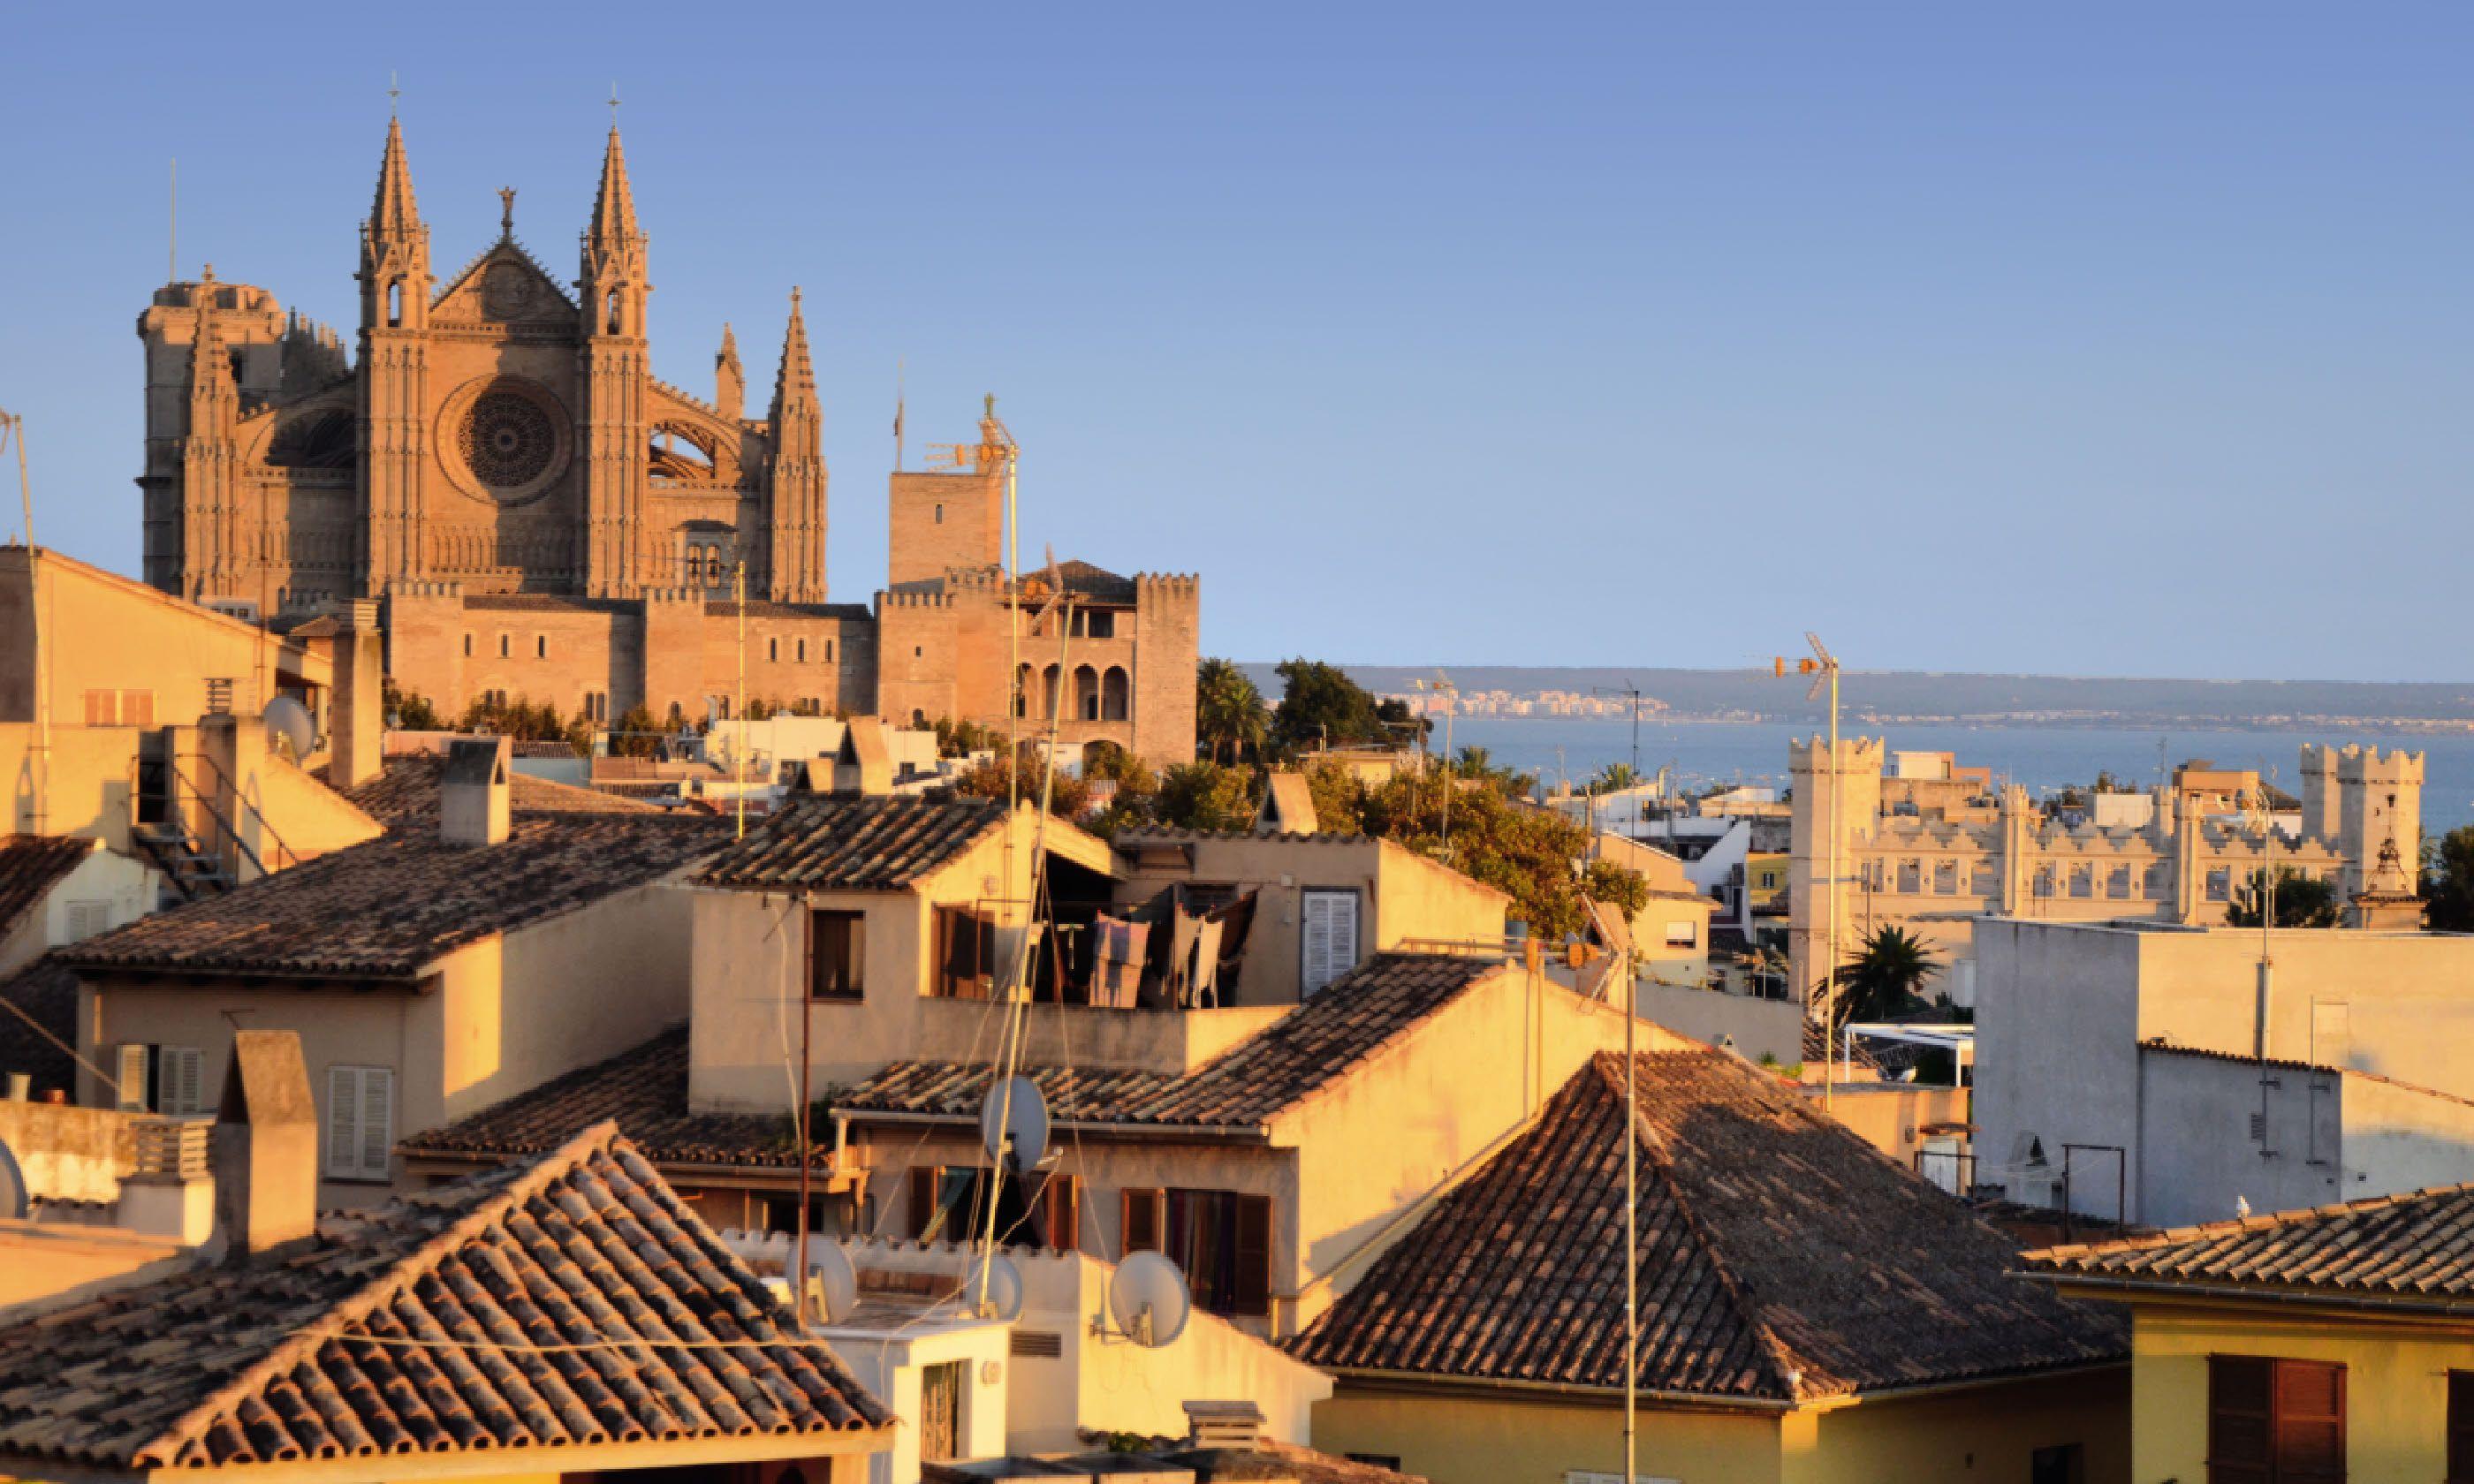 Palma, Mallorca (Neil S Price)